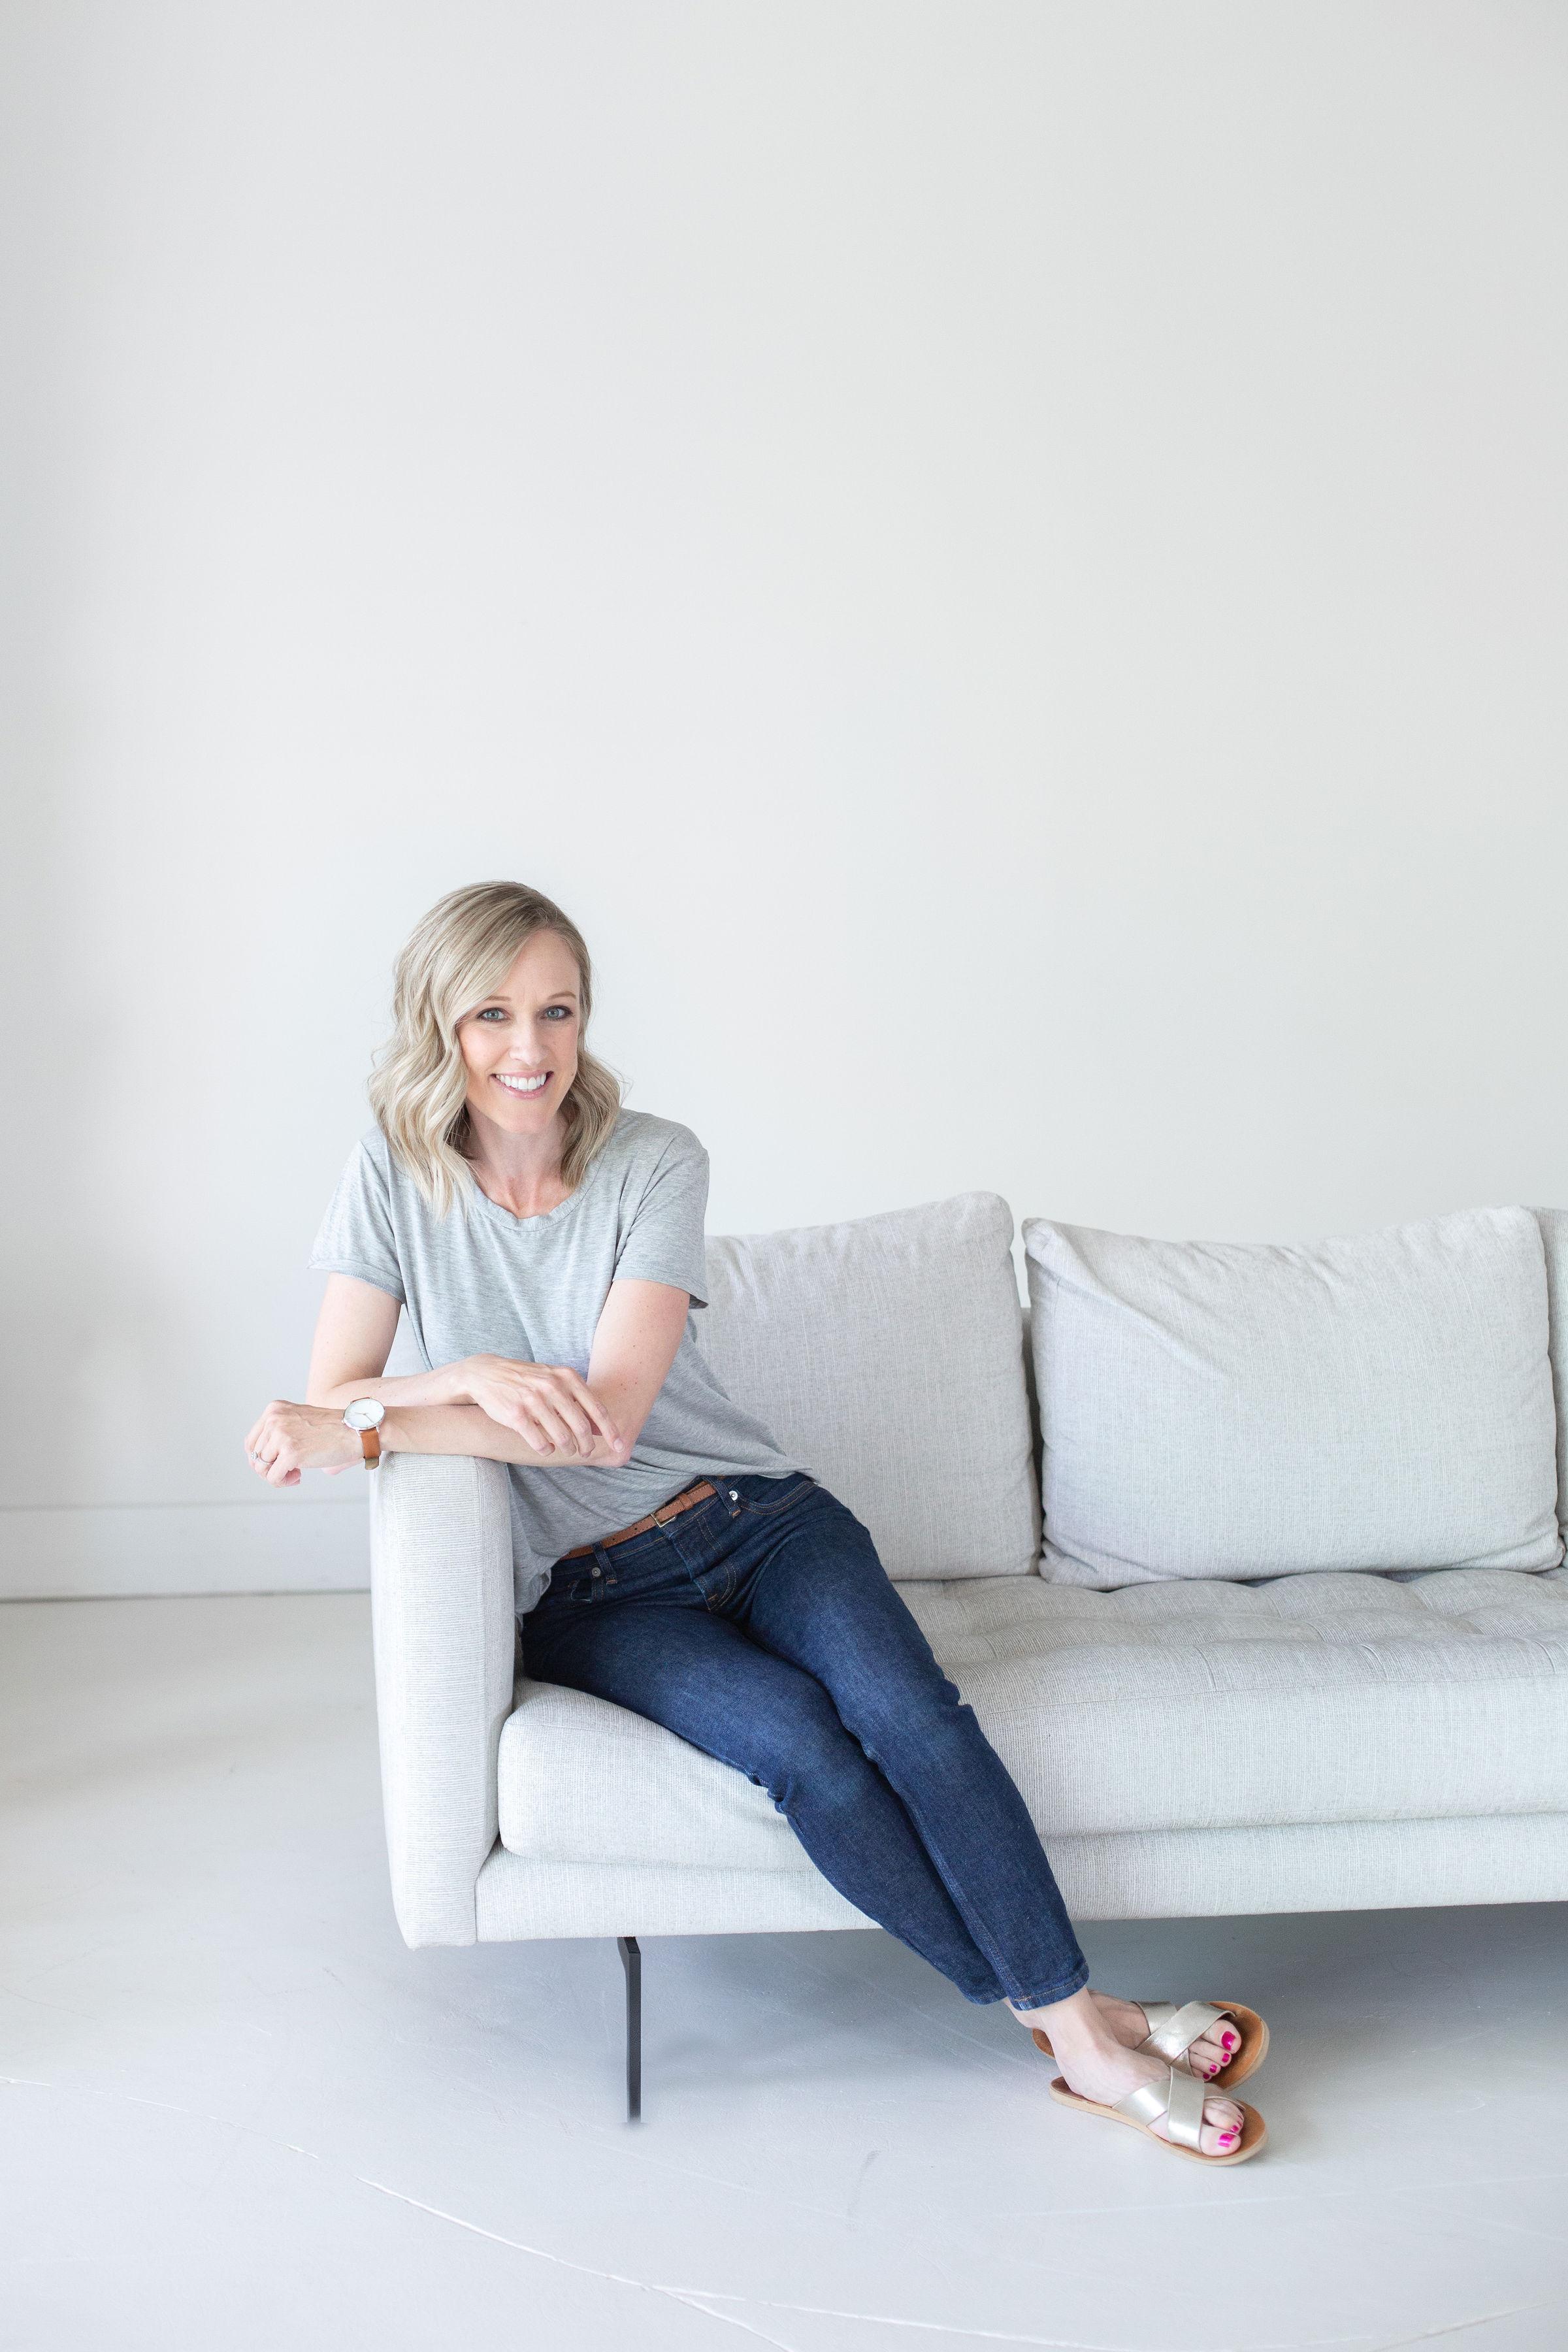 Meet Organizer & Organization Blogger: Kimberly